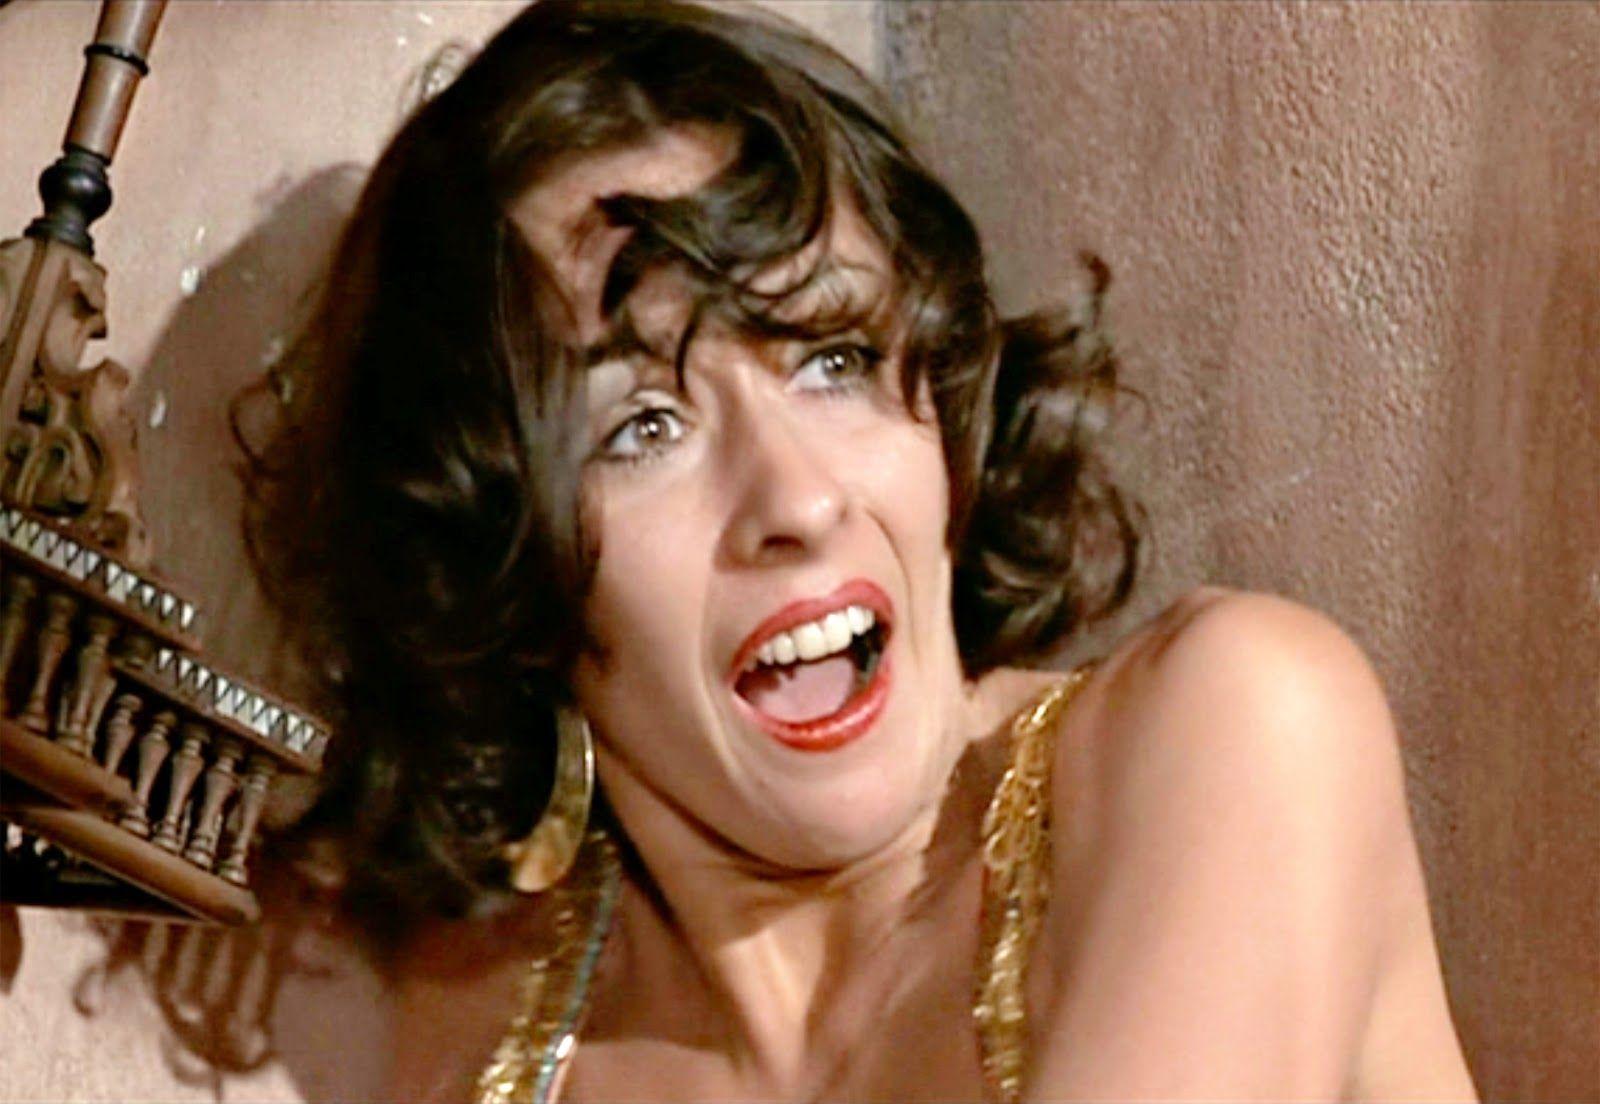 Constance Shotter,Valerie Weigmann (b. 1989) Erotic pics & movies Marissa Delgado (b. 1951),Max Collins (b. 1992)